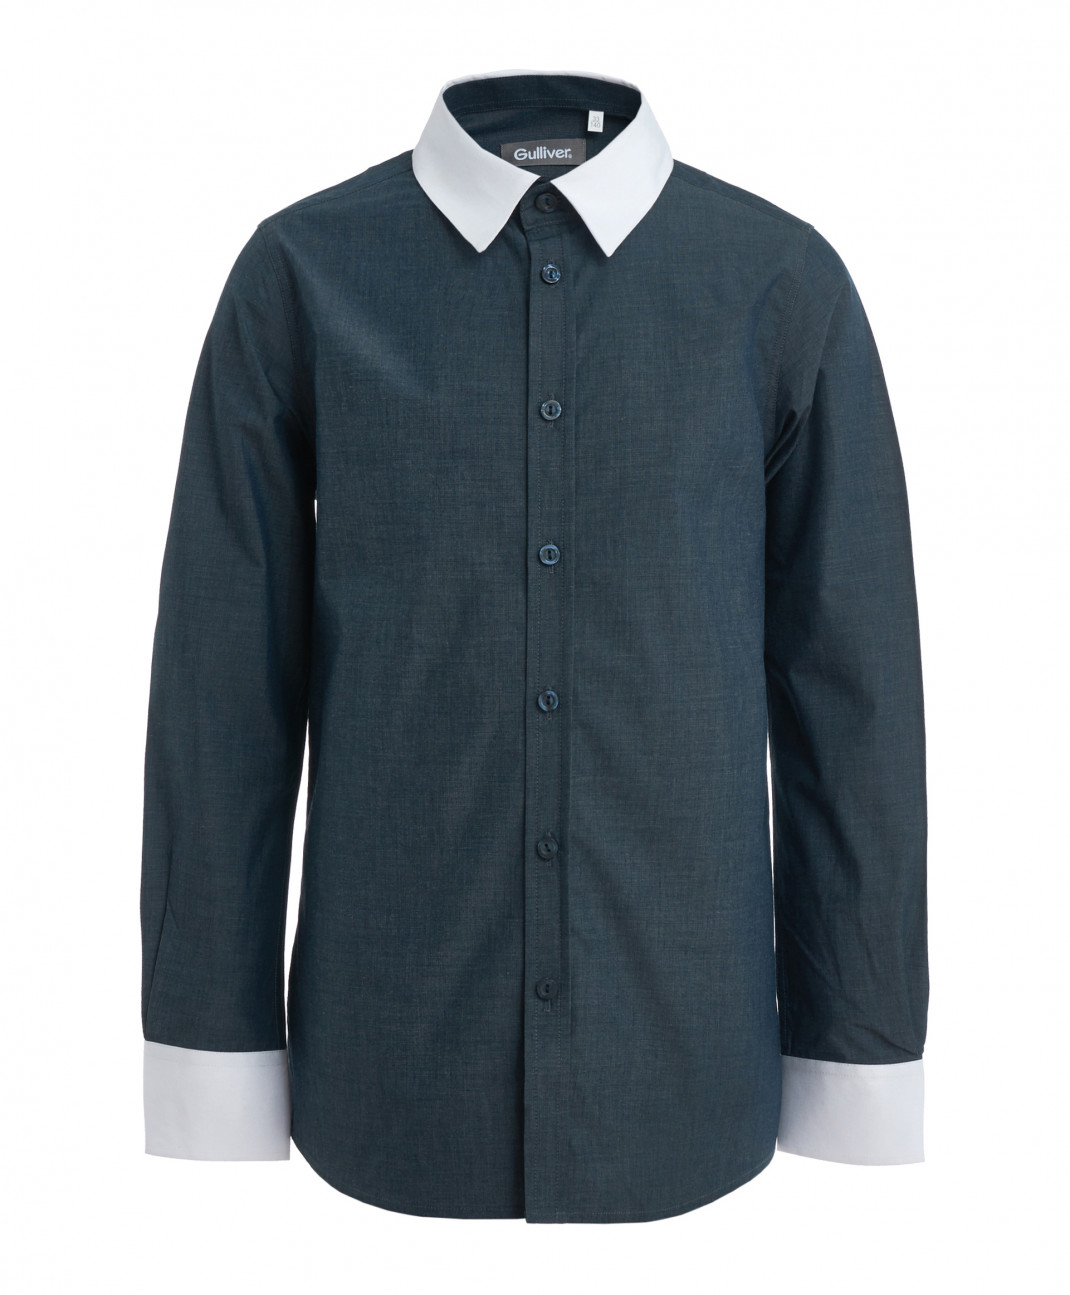 Gulliver Серо-синяя рубашка Gulliver